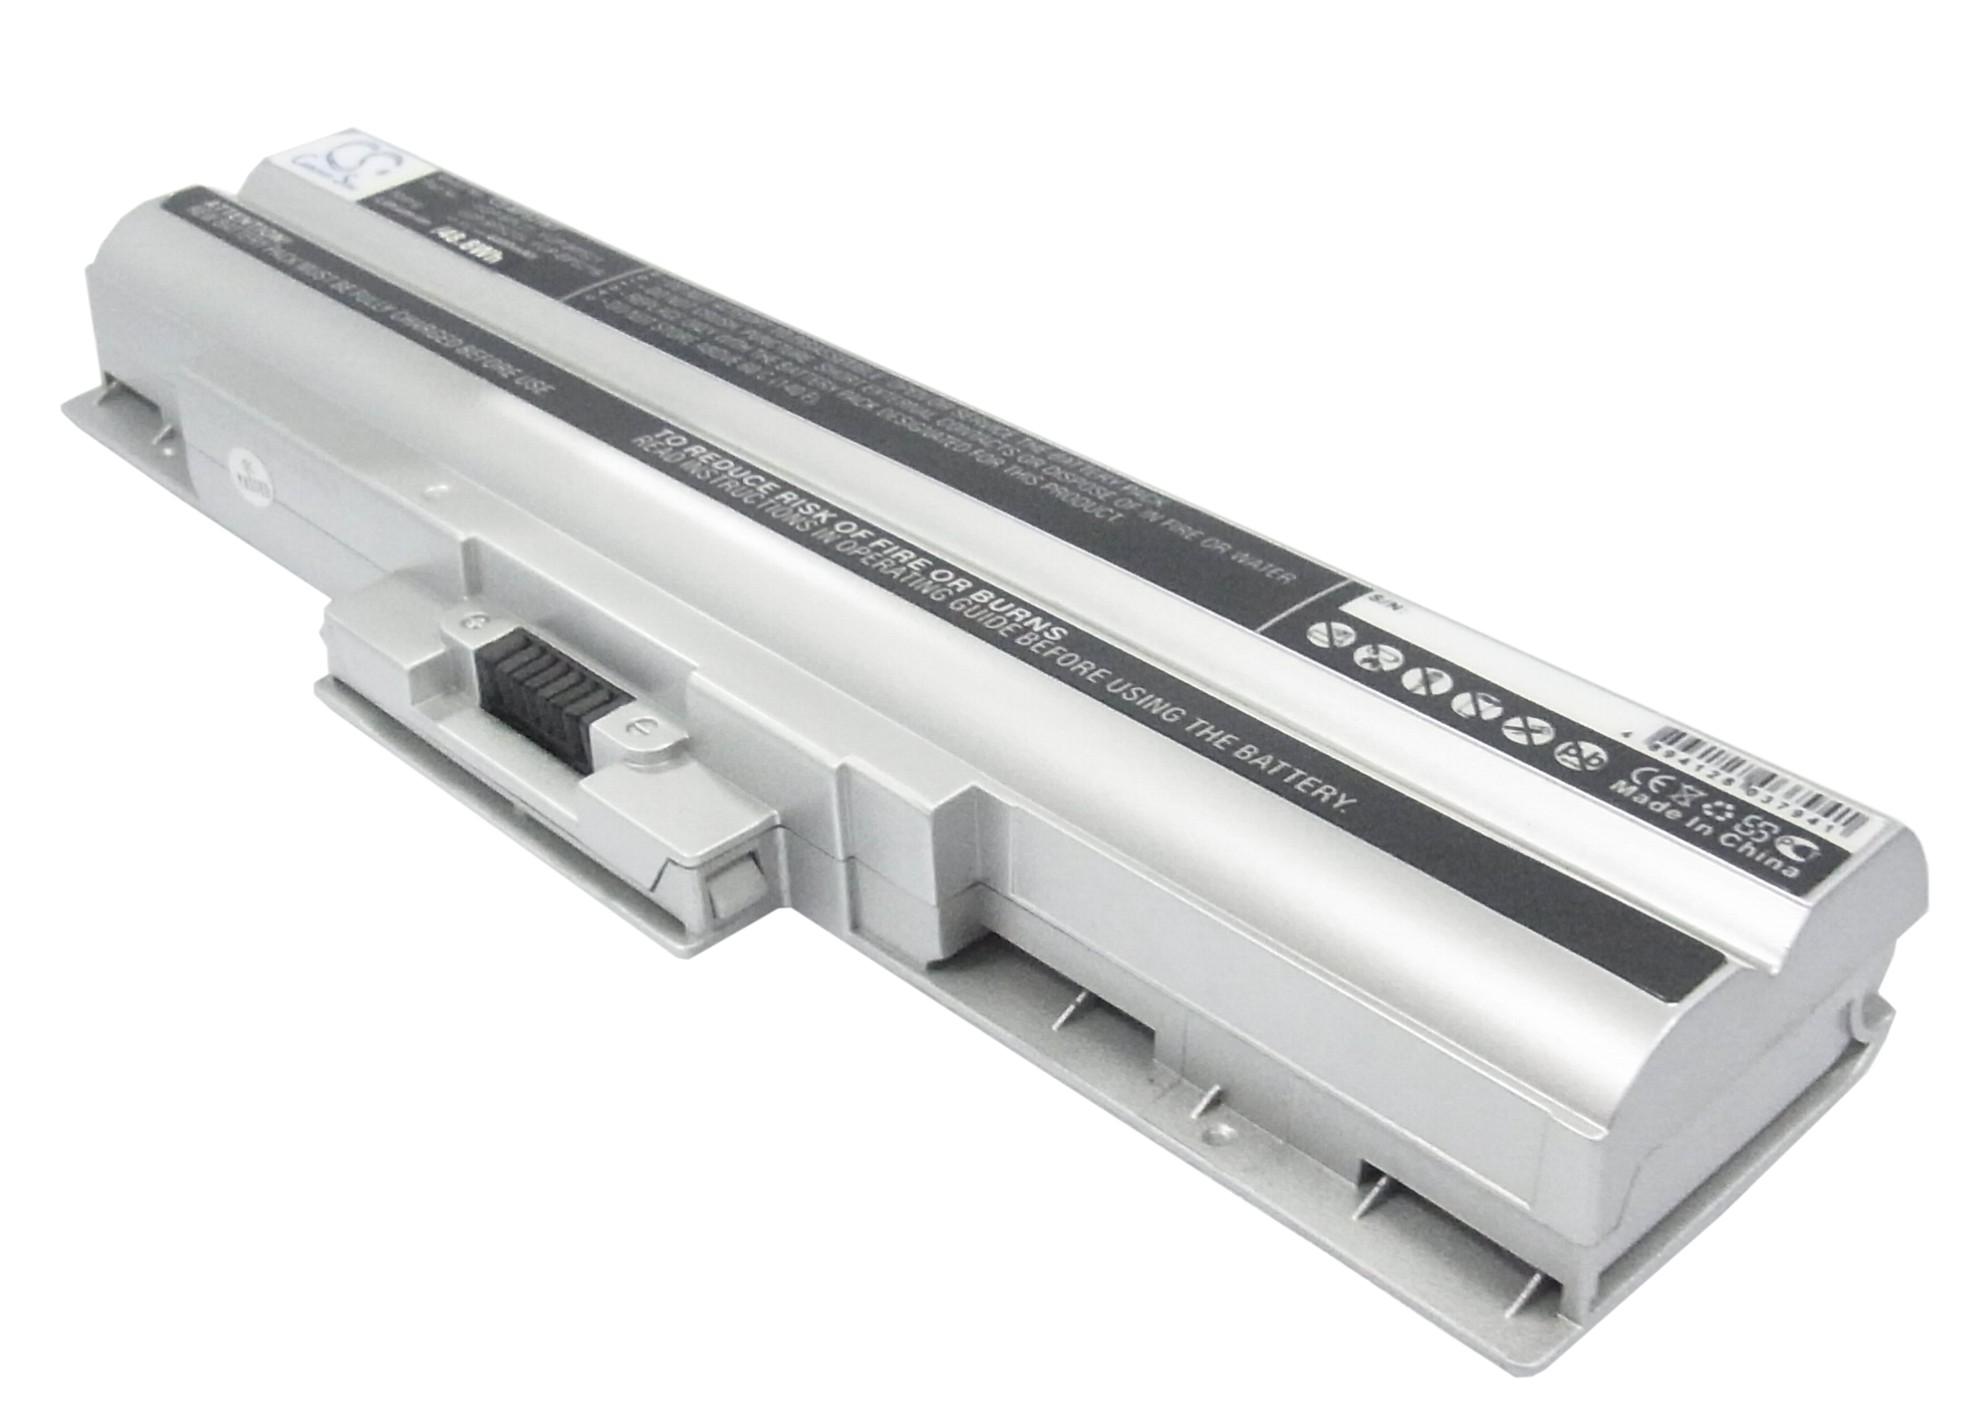 Cameron Sino baterie do notebooků pro SONY VAIO VGN-CS36GJ/W 11.1V Li-ion 4400mAh stříbrná - neoriginální